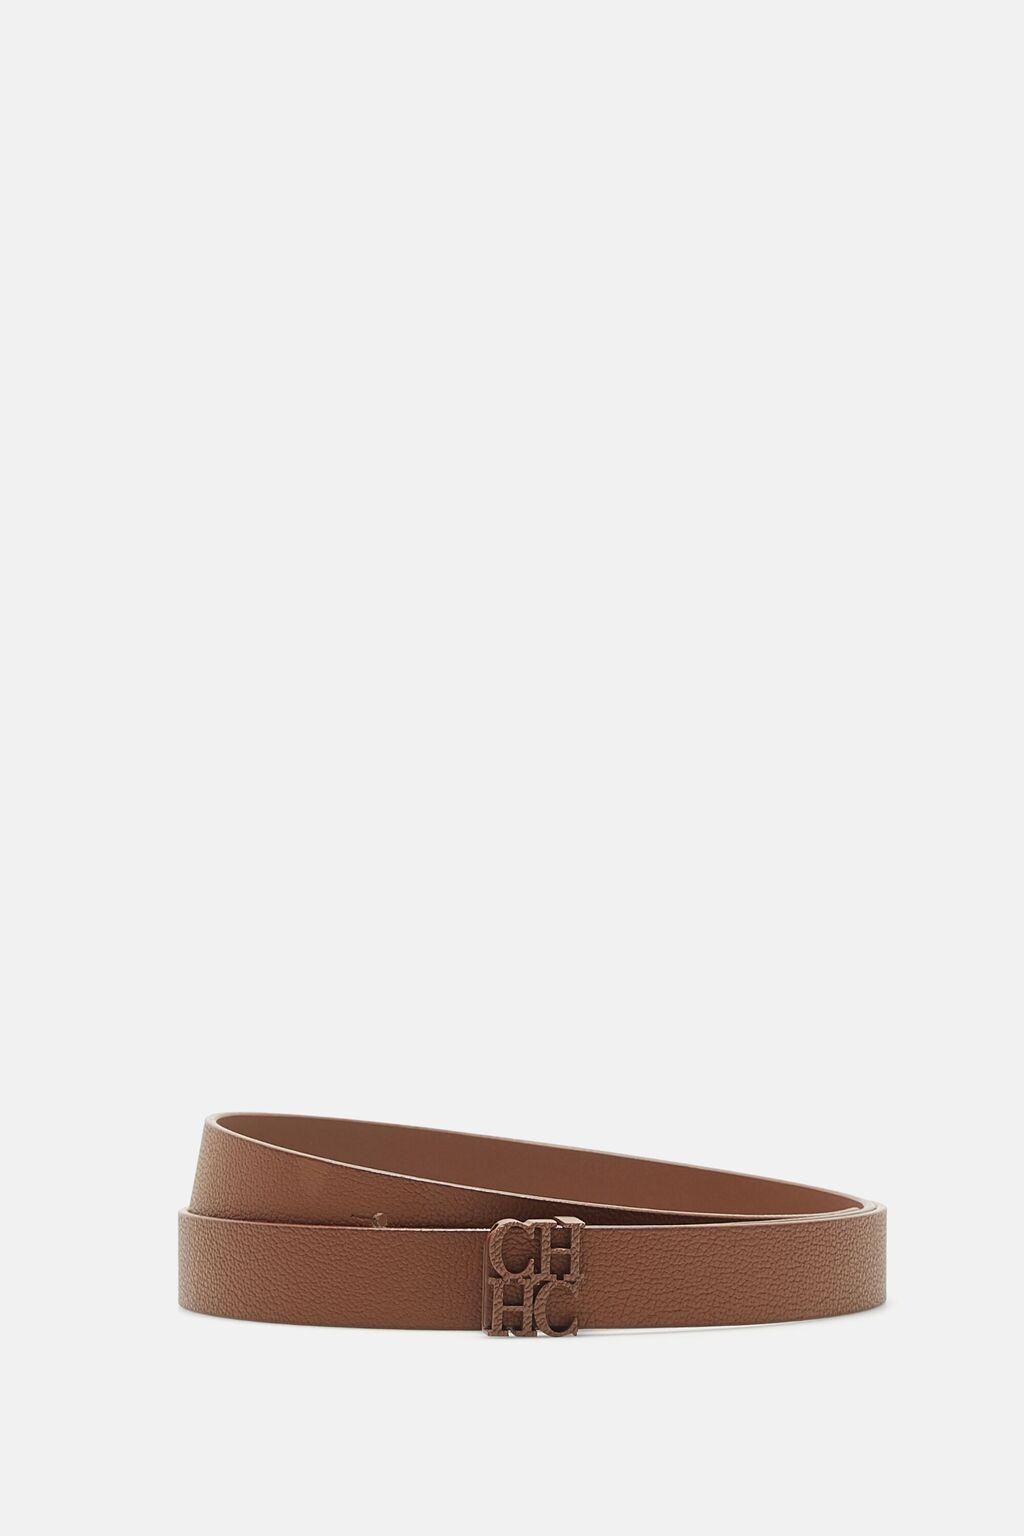 CHHC leather belt